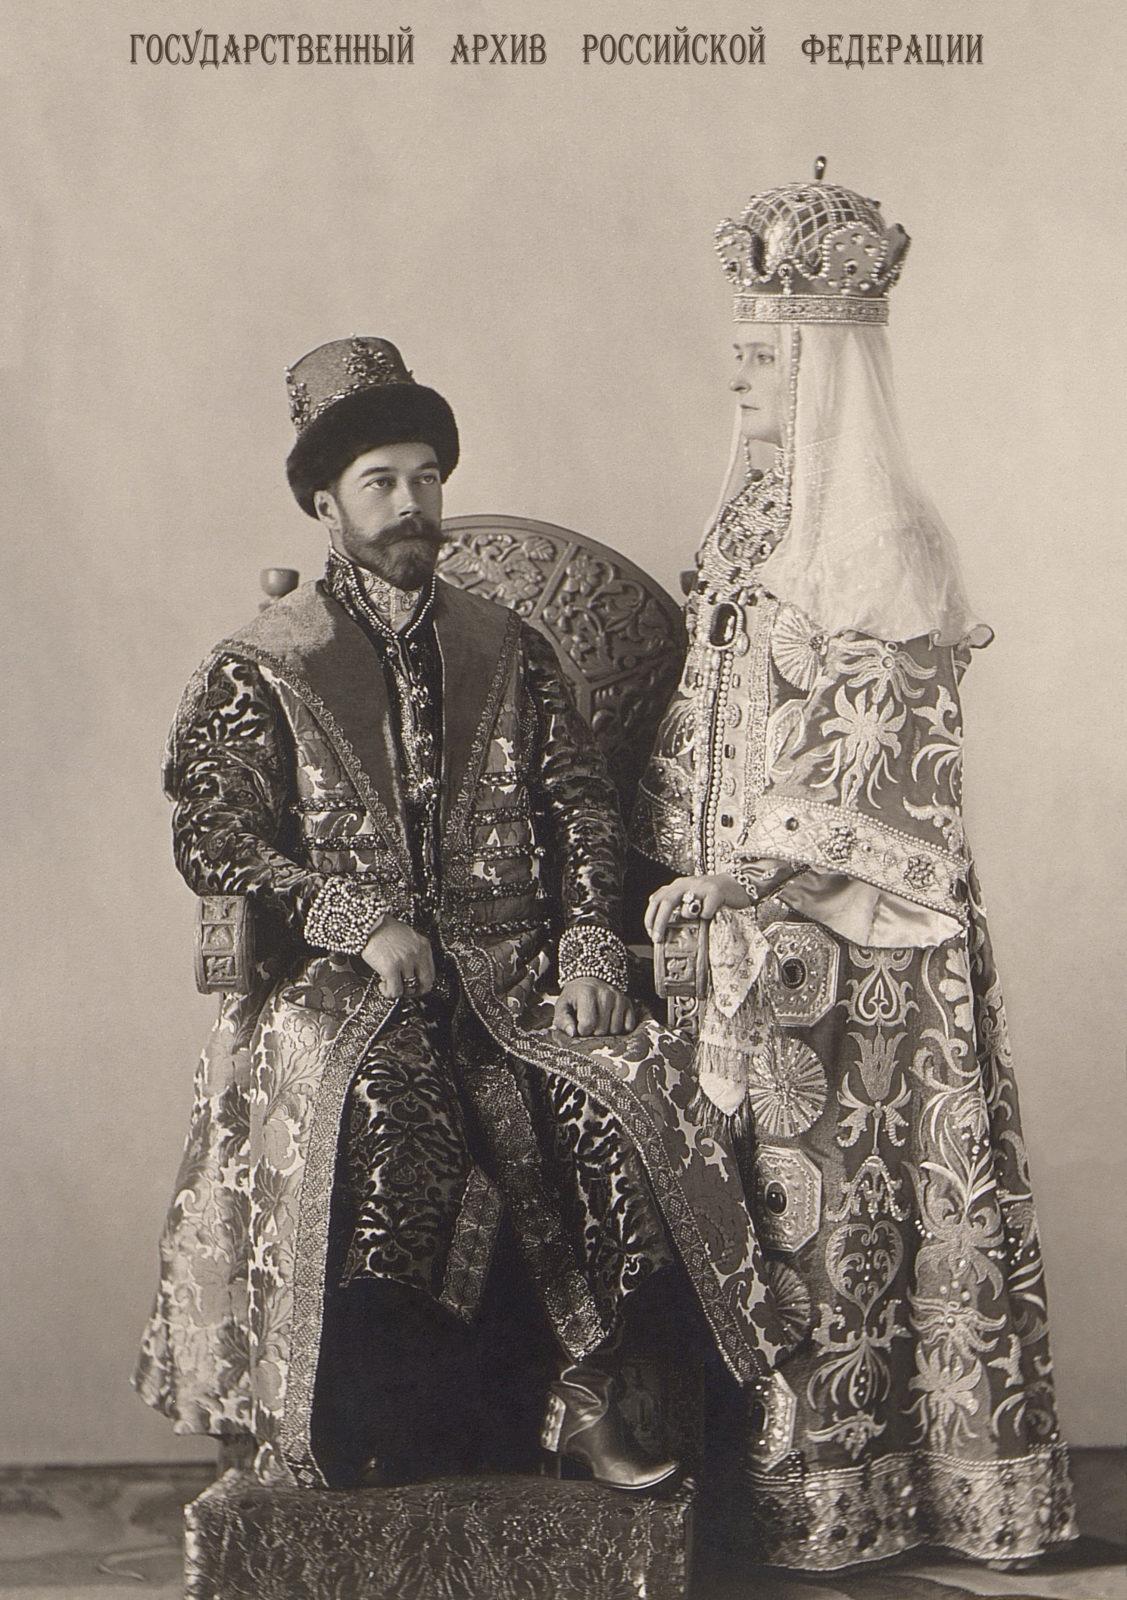 Emperor Nicholas II and Empress Alexandra Feodorovna in Russiantraditional costumes